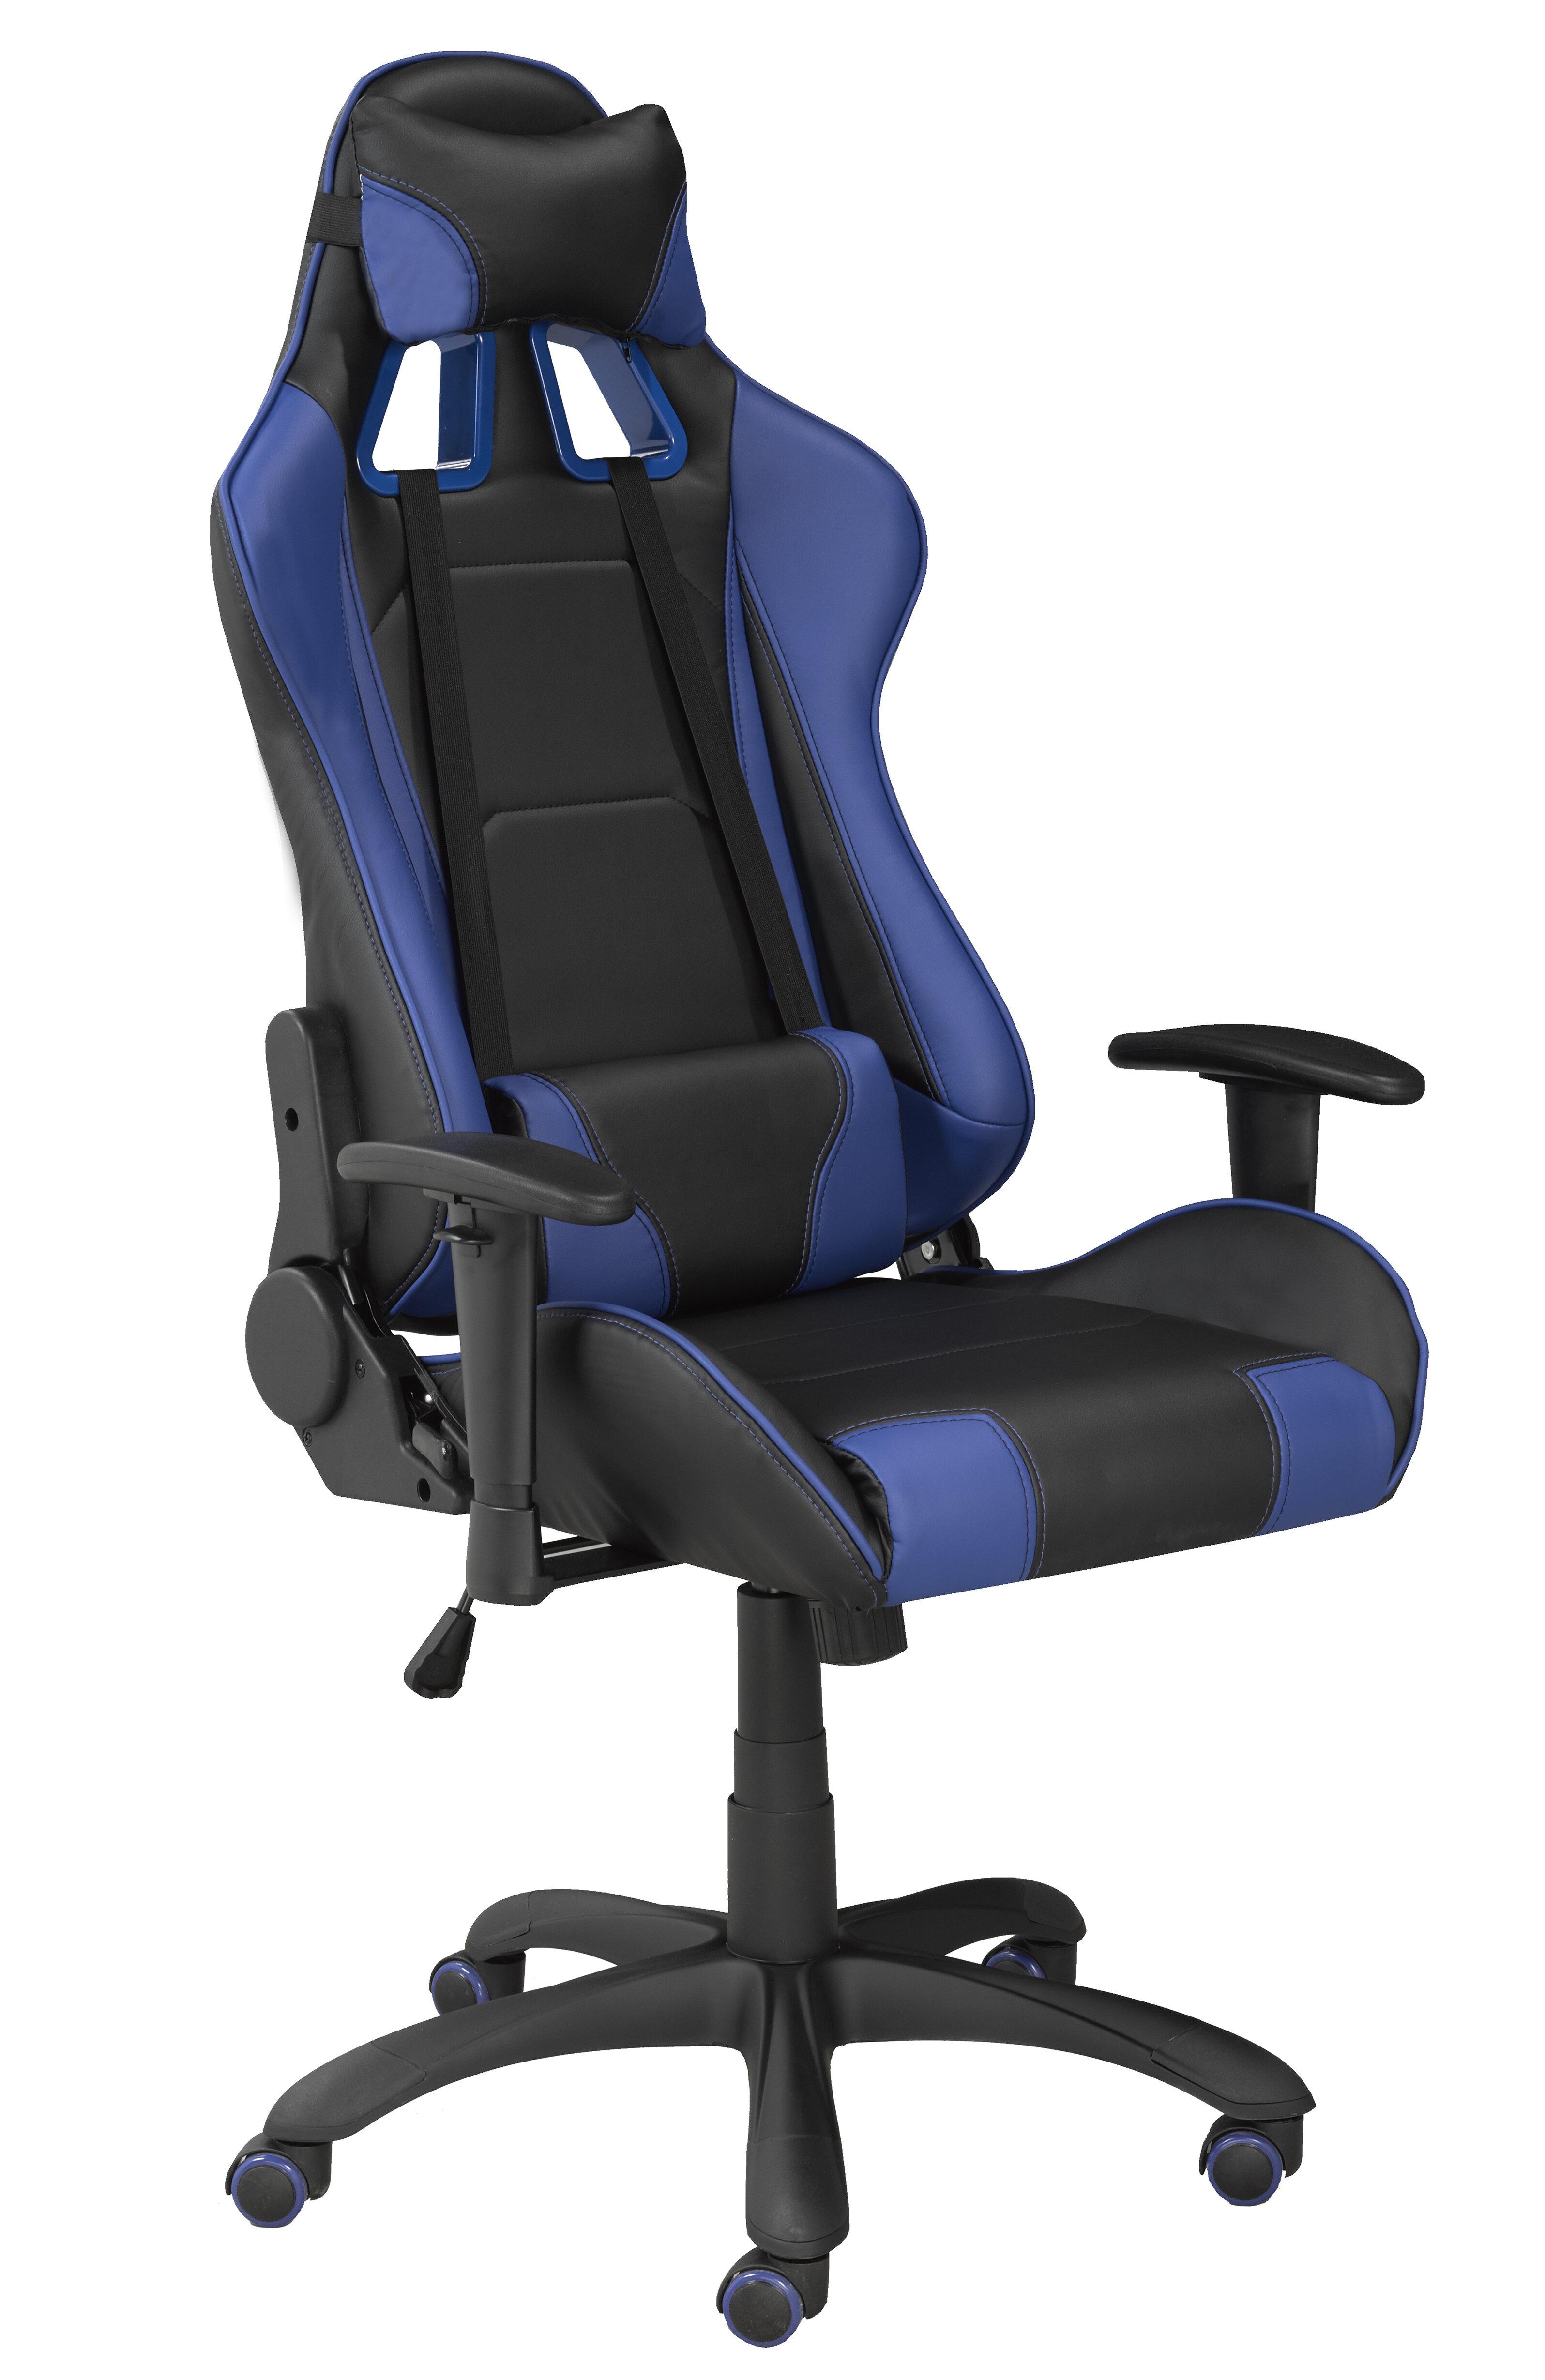 Superb Racing Gaming Chair With Tilt Recline Machost Co Dining Chair Design Ideas Machostcouk